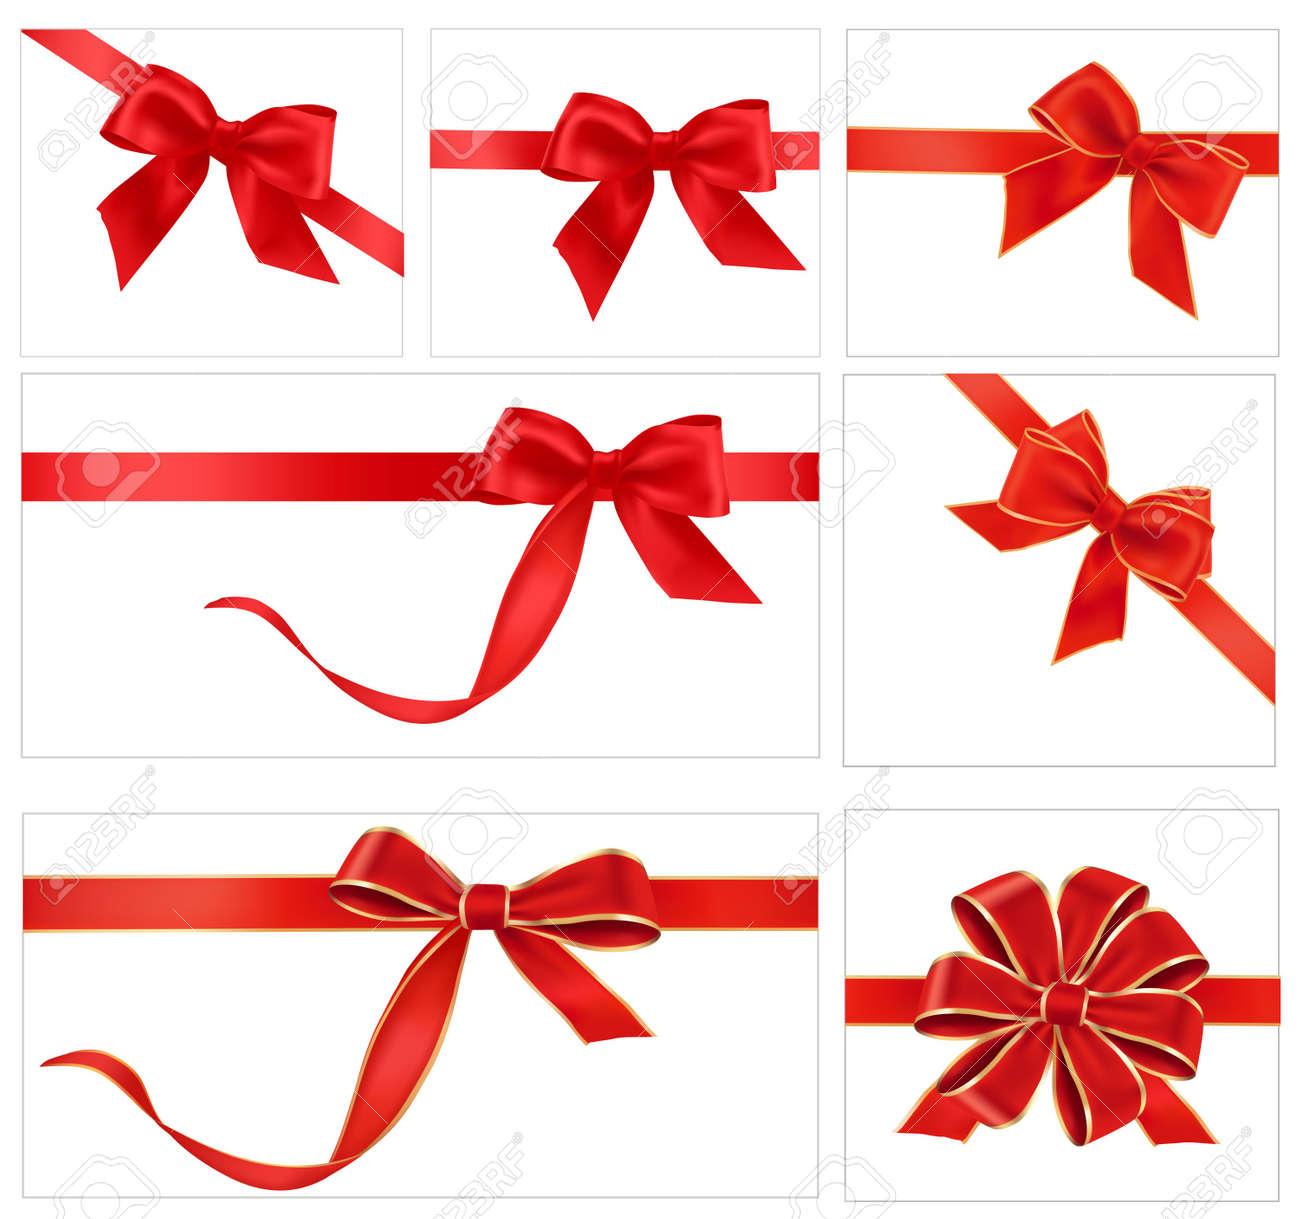 Бантик на подарок завязать